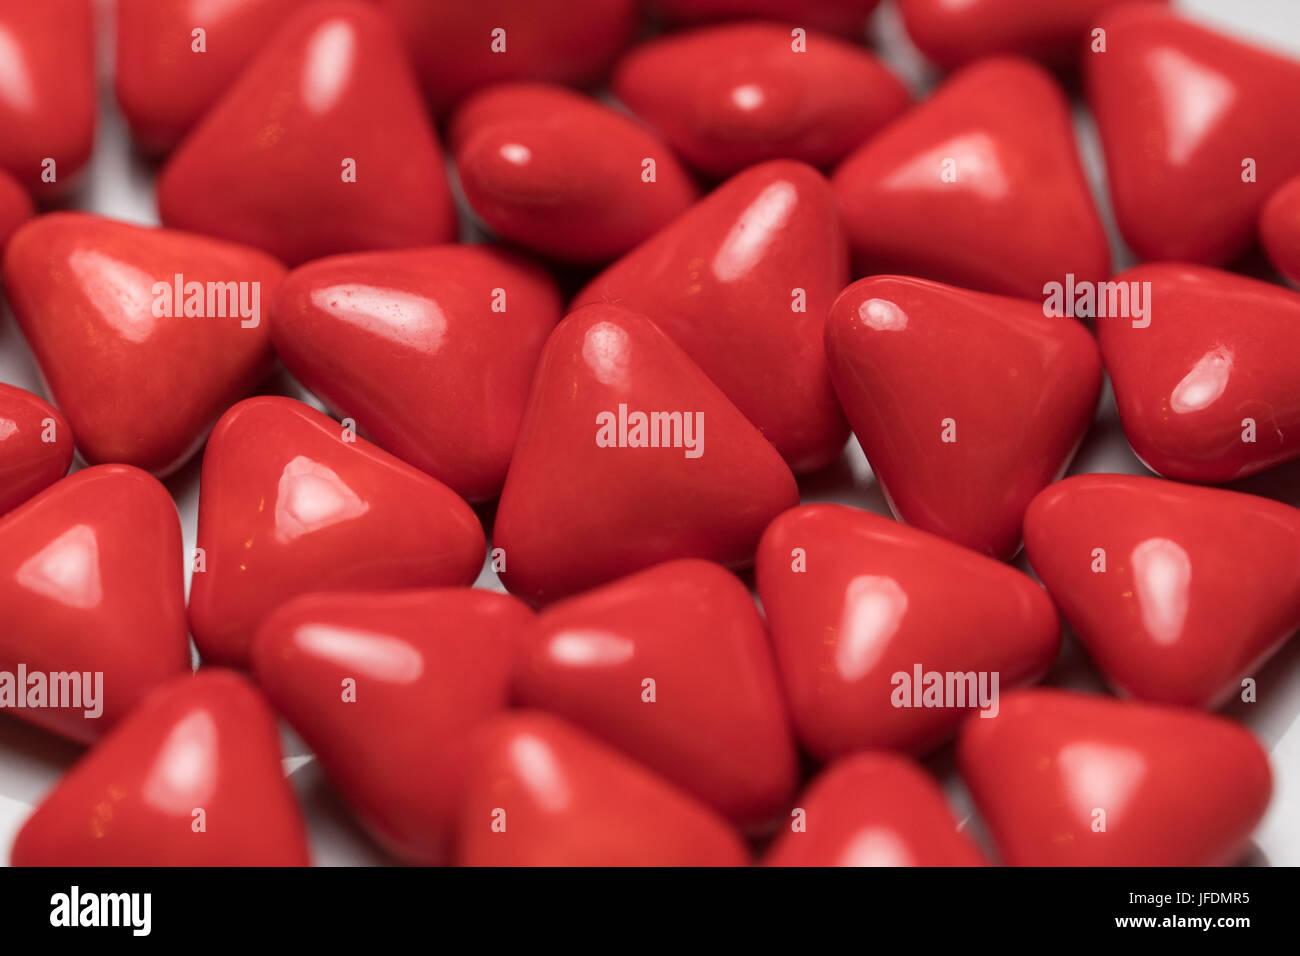 Drug Wallpaper Stockfotos & Drug Wallpaper Bilder - Alamy